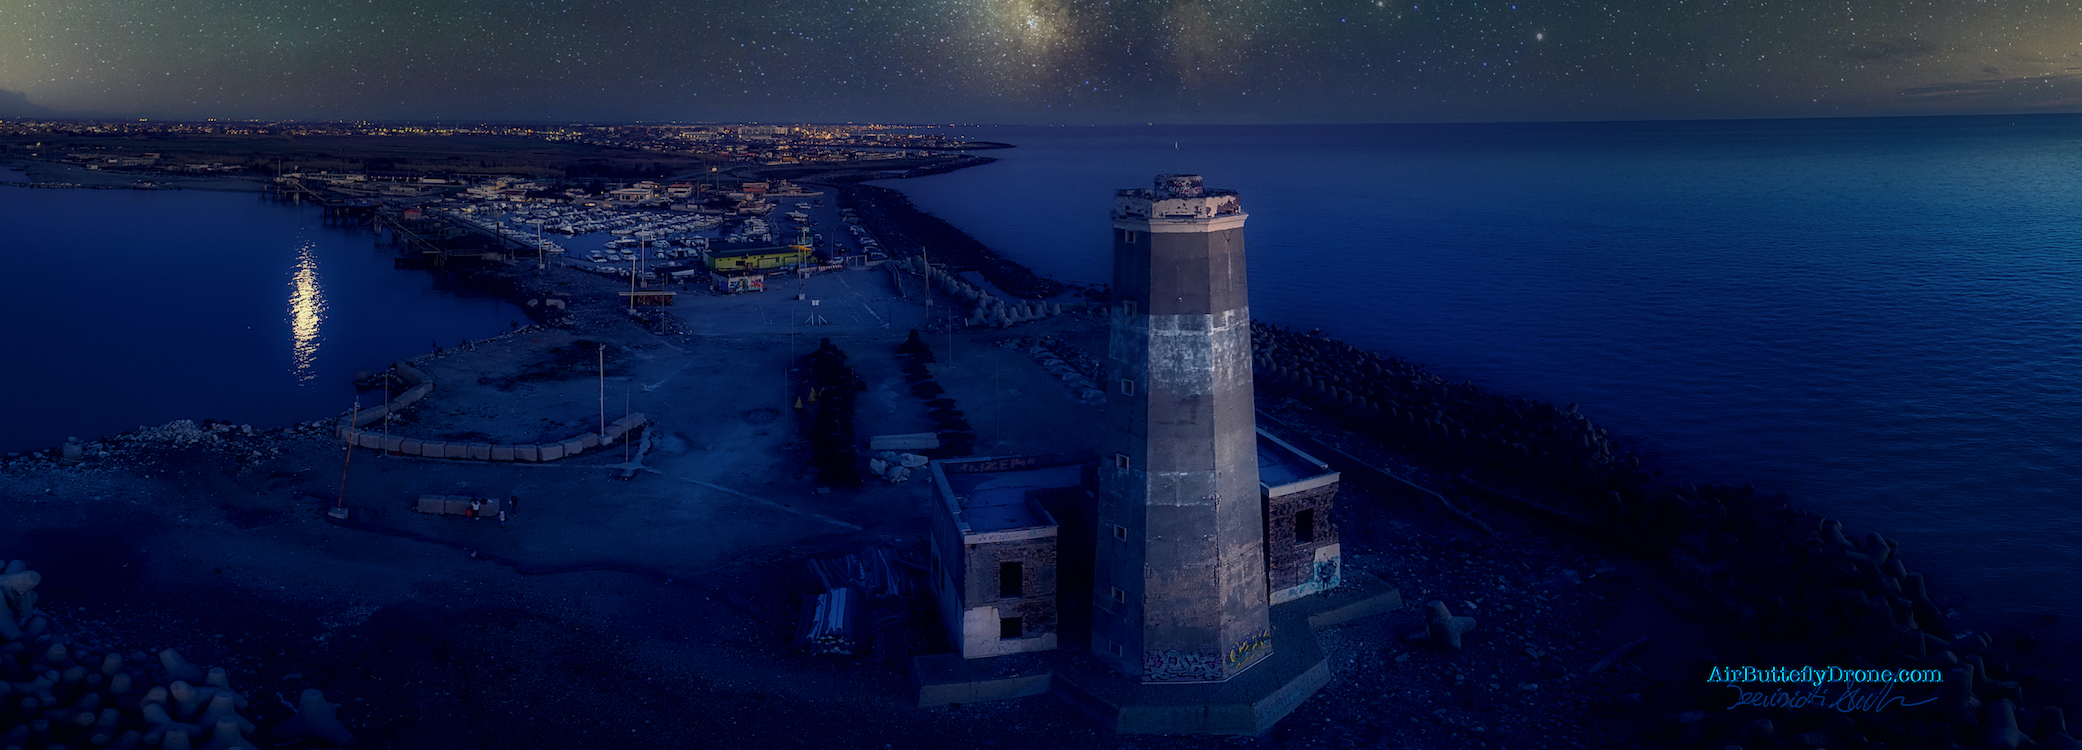 DJI lighthouse on the night  ALEX.jpeg